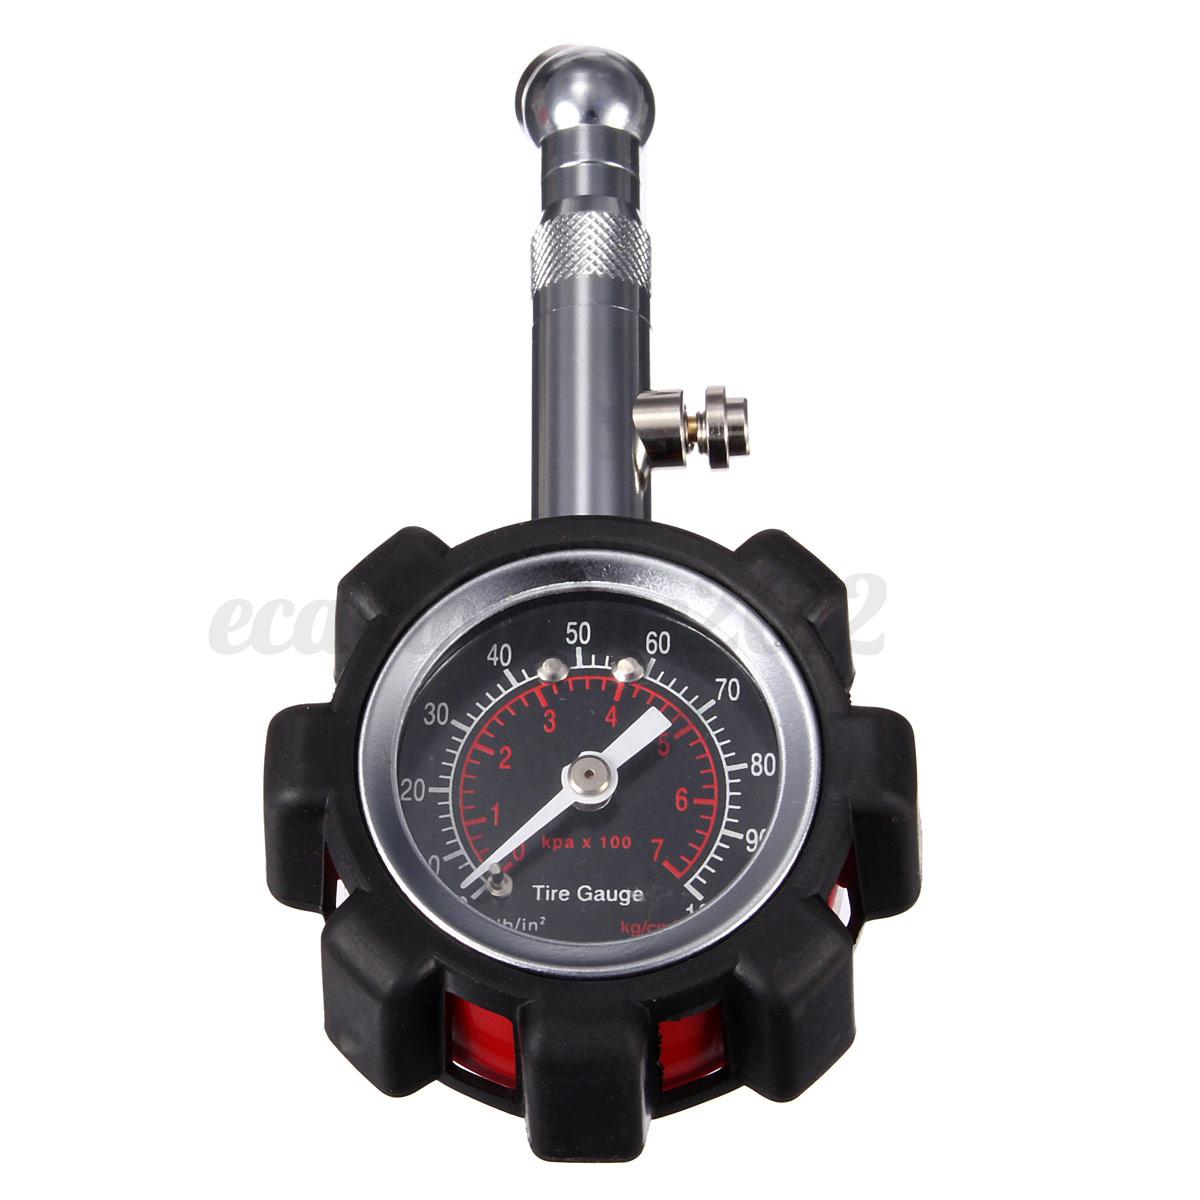 motor car truck bike tyre tire air pressure gauge dial meter tester 0 100 psi. Black Bedroom Furniture Sets. Home Design Ideas